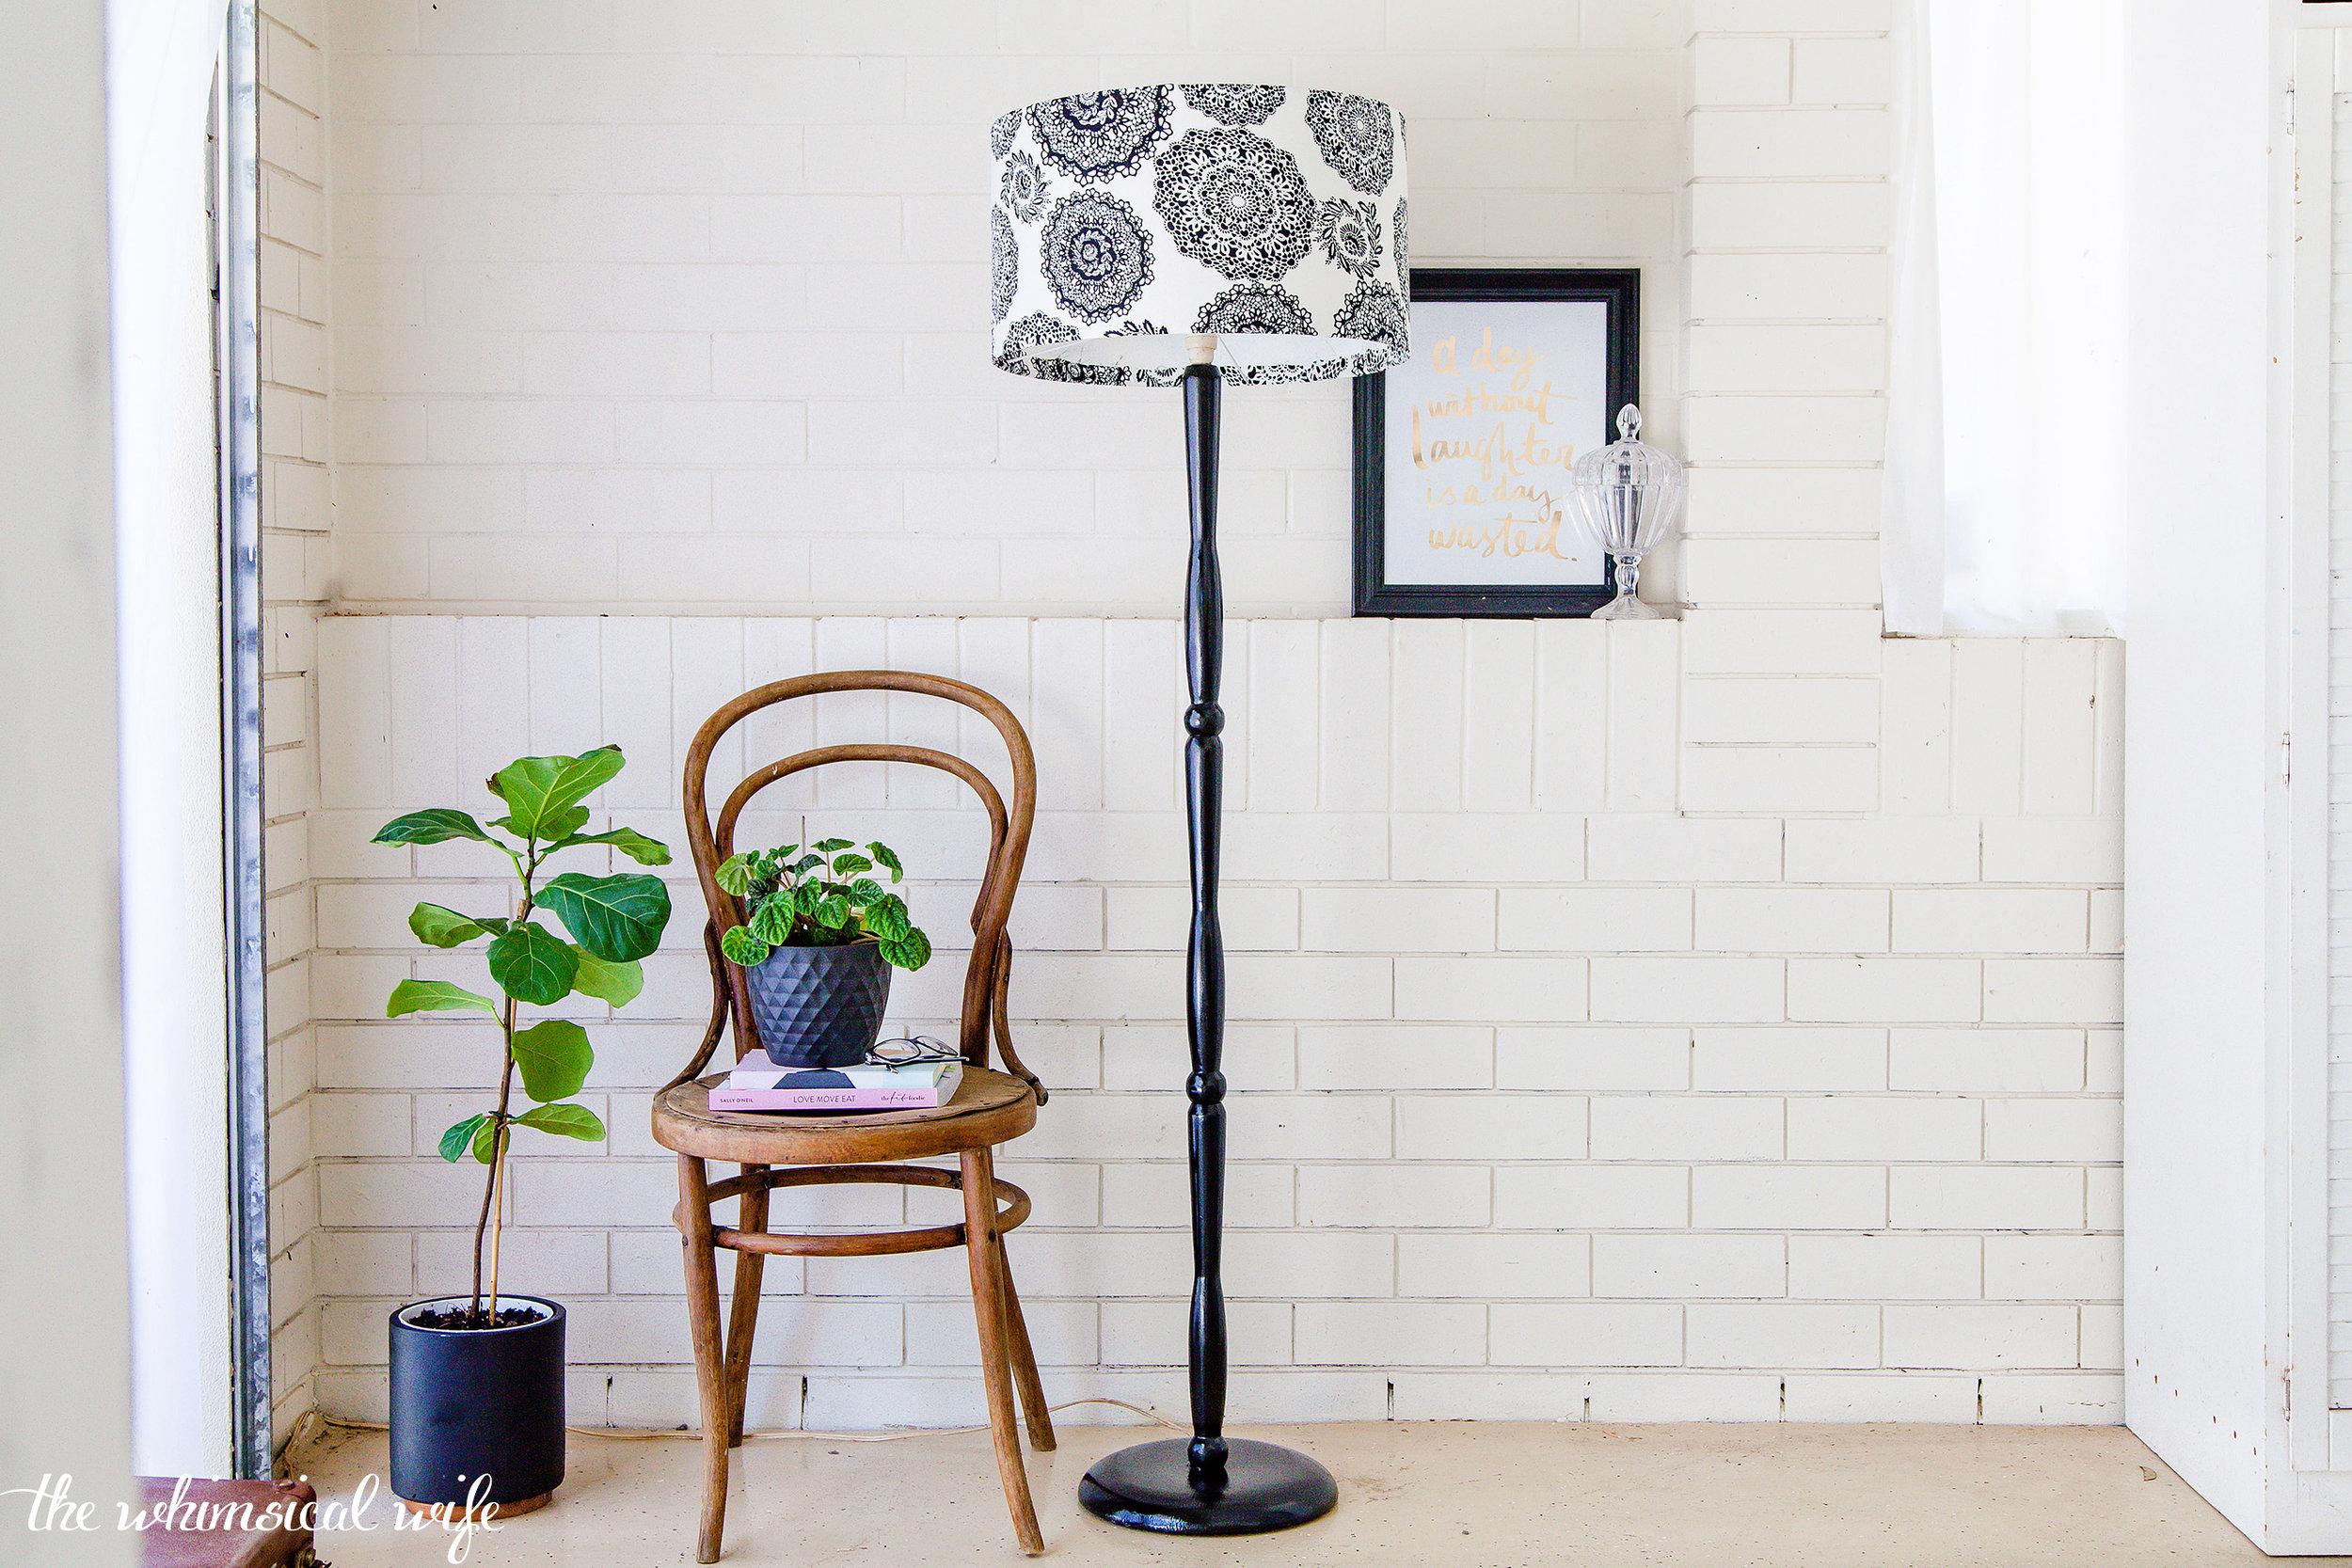 LampStand-4312.jpg